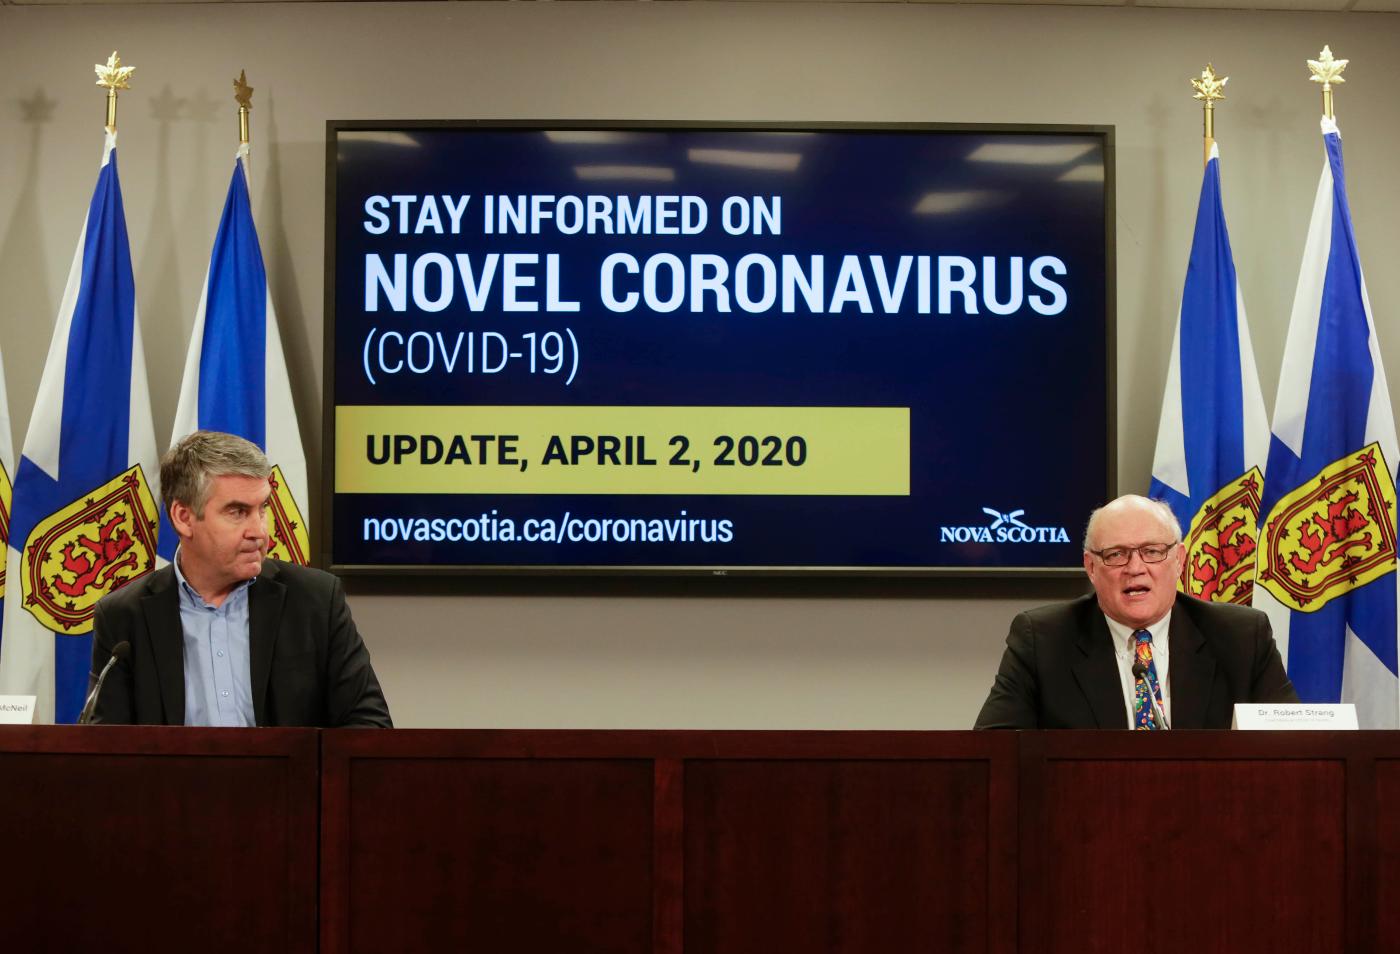 Premier Stephen McNeil and Dr. Robert Strang